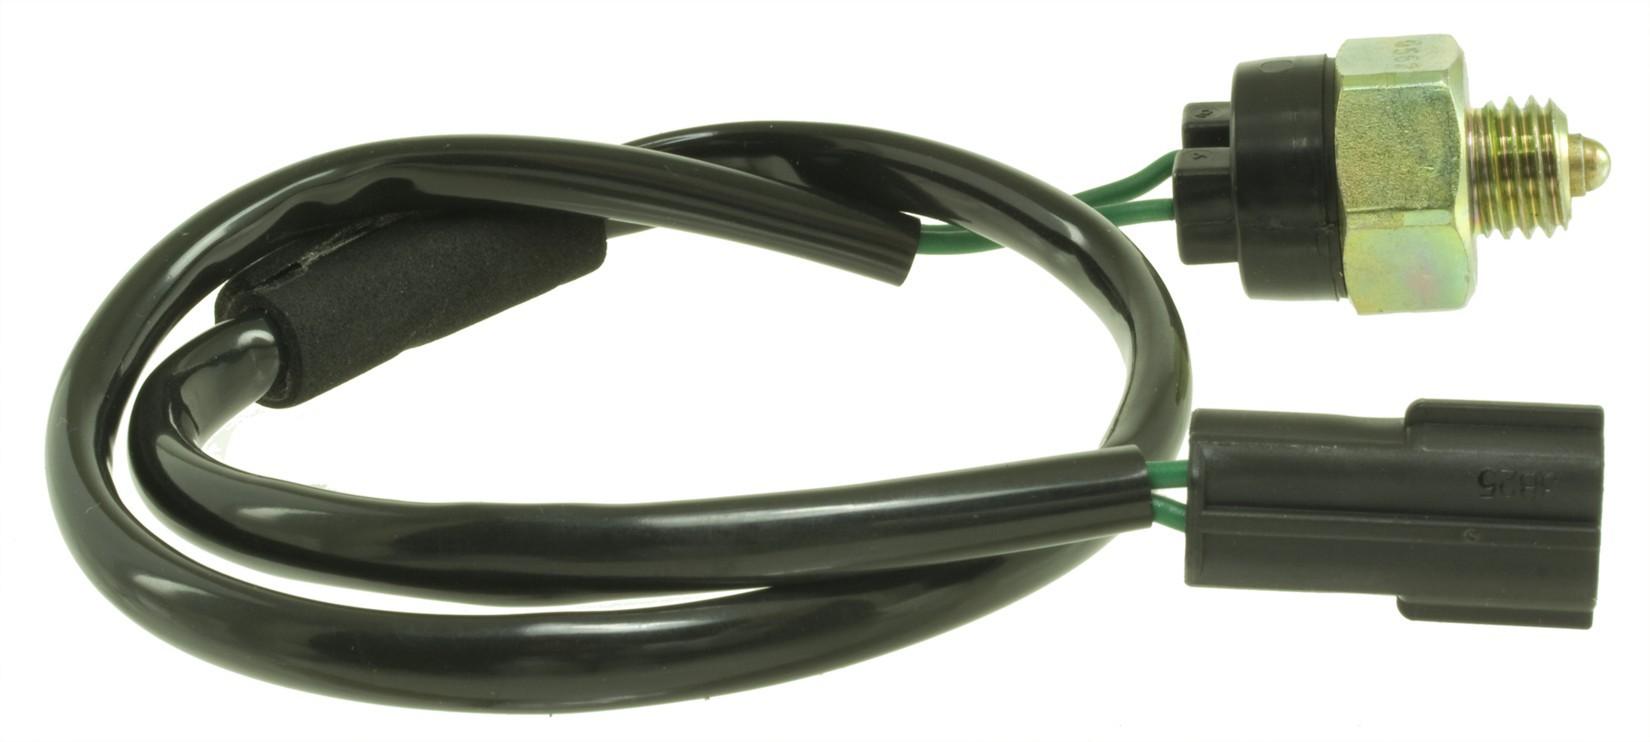 WELLS - Clutch Pedal Ignition Lock Switch - WEL JA4351